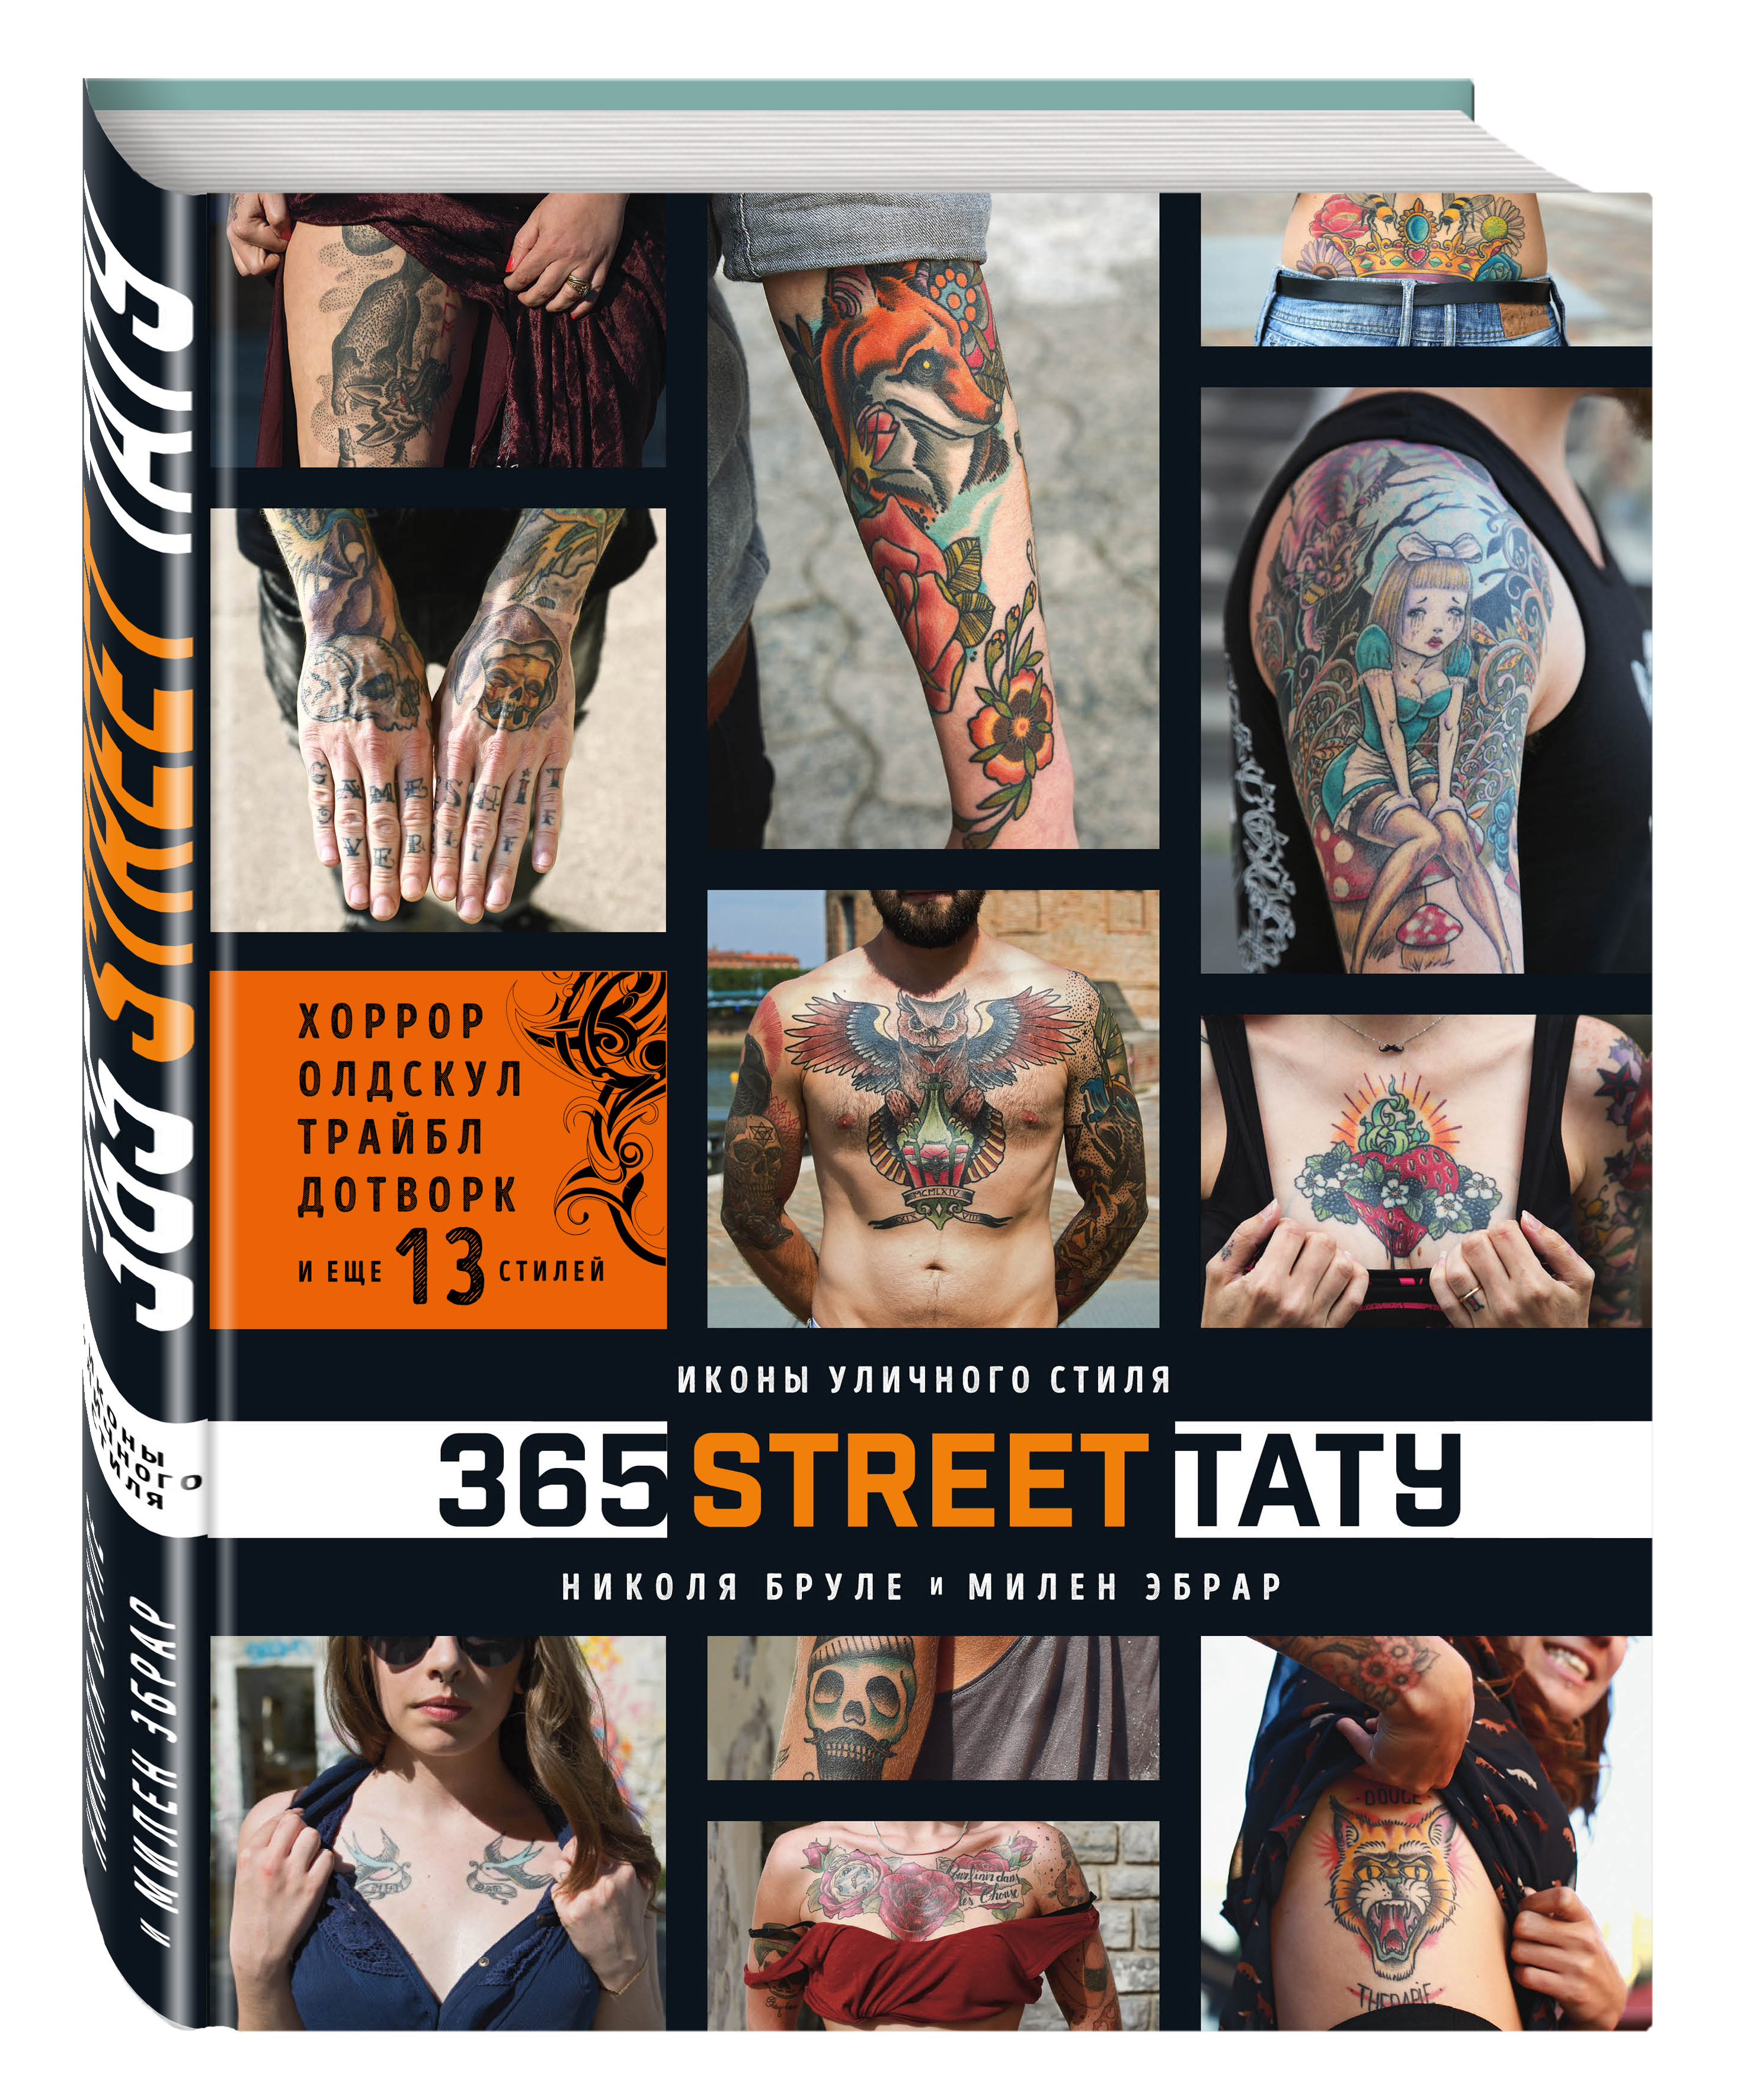 Николя Бруле, Милен Эбрар 365 street-тату. Иконы уличного стиля бруле н эбрар м 365 street тату иконы уличного стиля